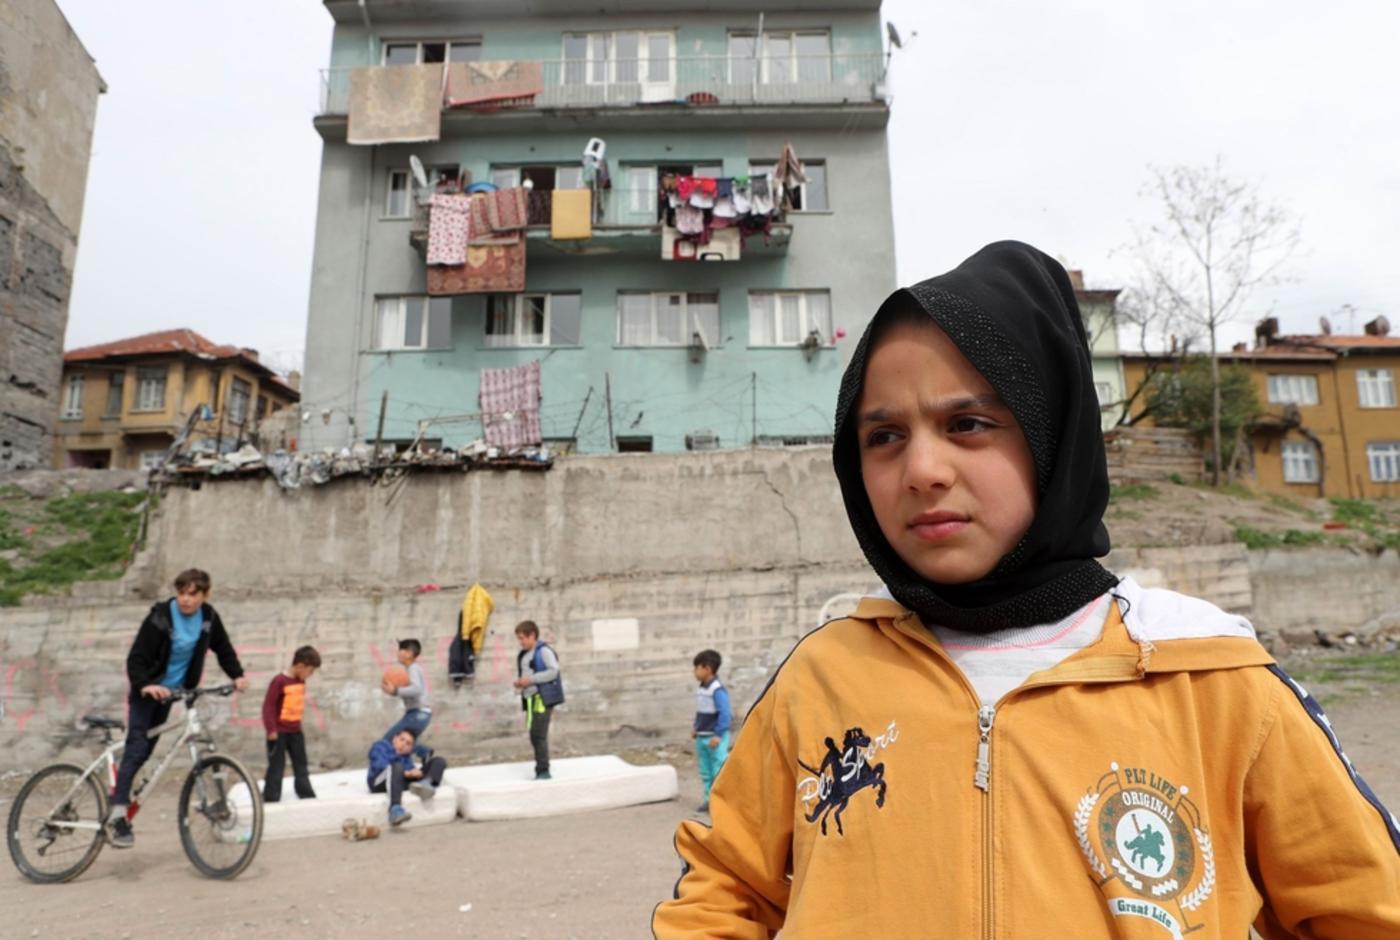 Born in Turkey: Syrian children face uncertain future in new homeland